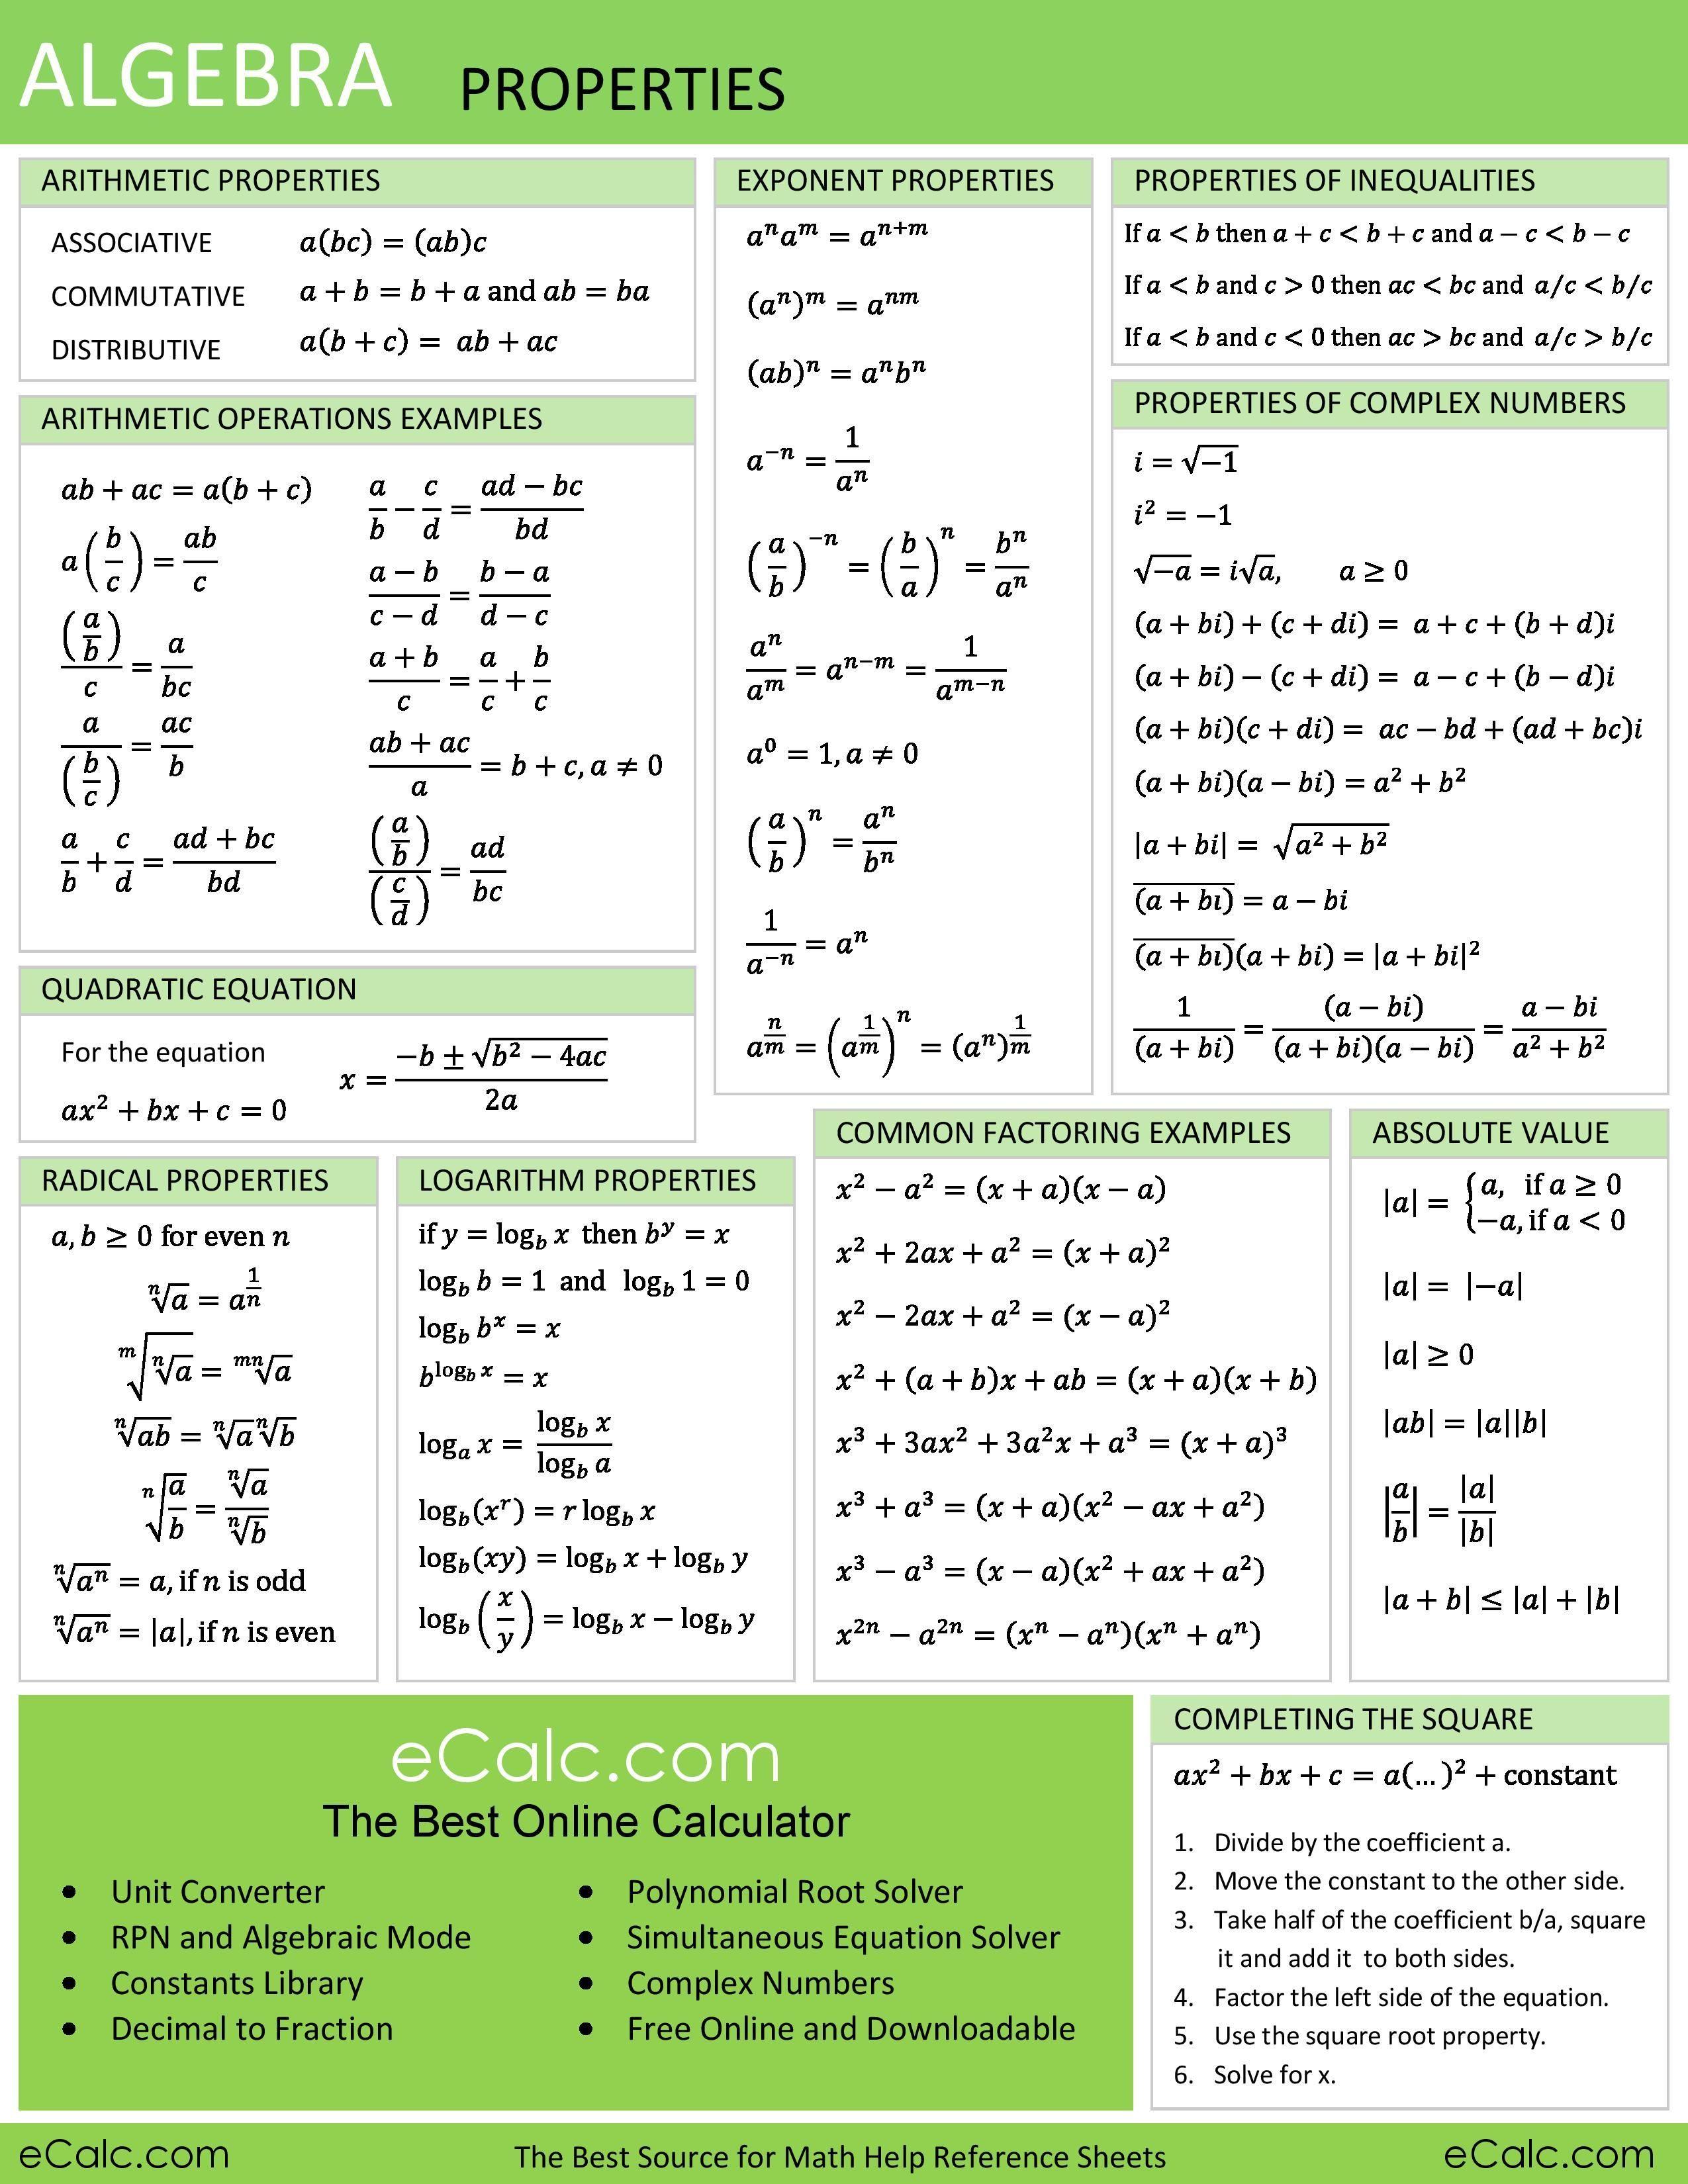 Algebra Properties Ecalc S Math Help Reference Sheet Algebra Ecalc Properties Reference Sheet New Math Methods Gre Math College Algebra